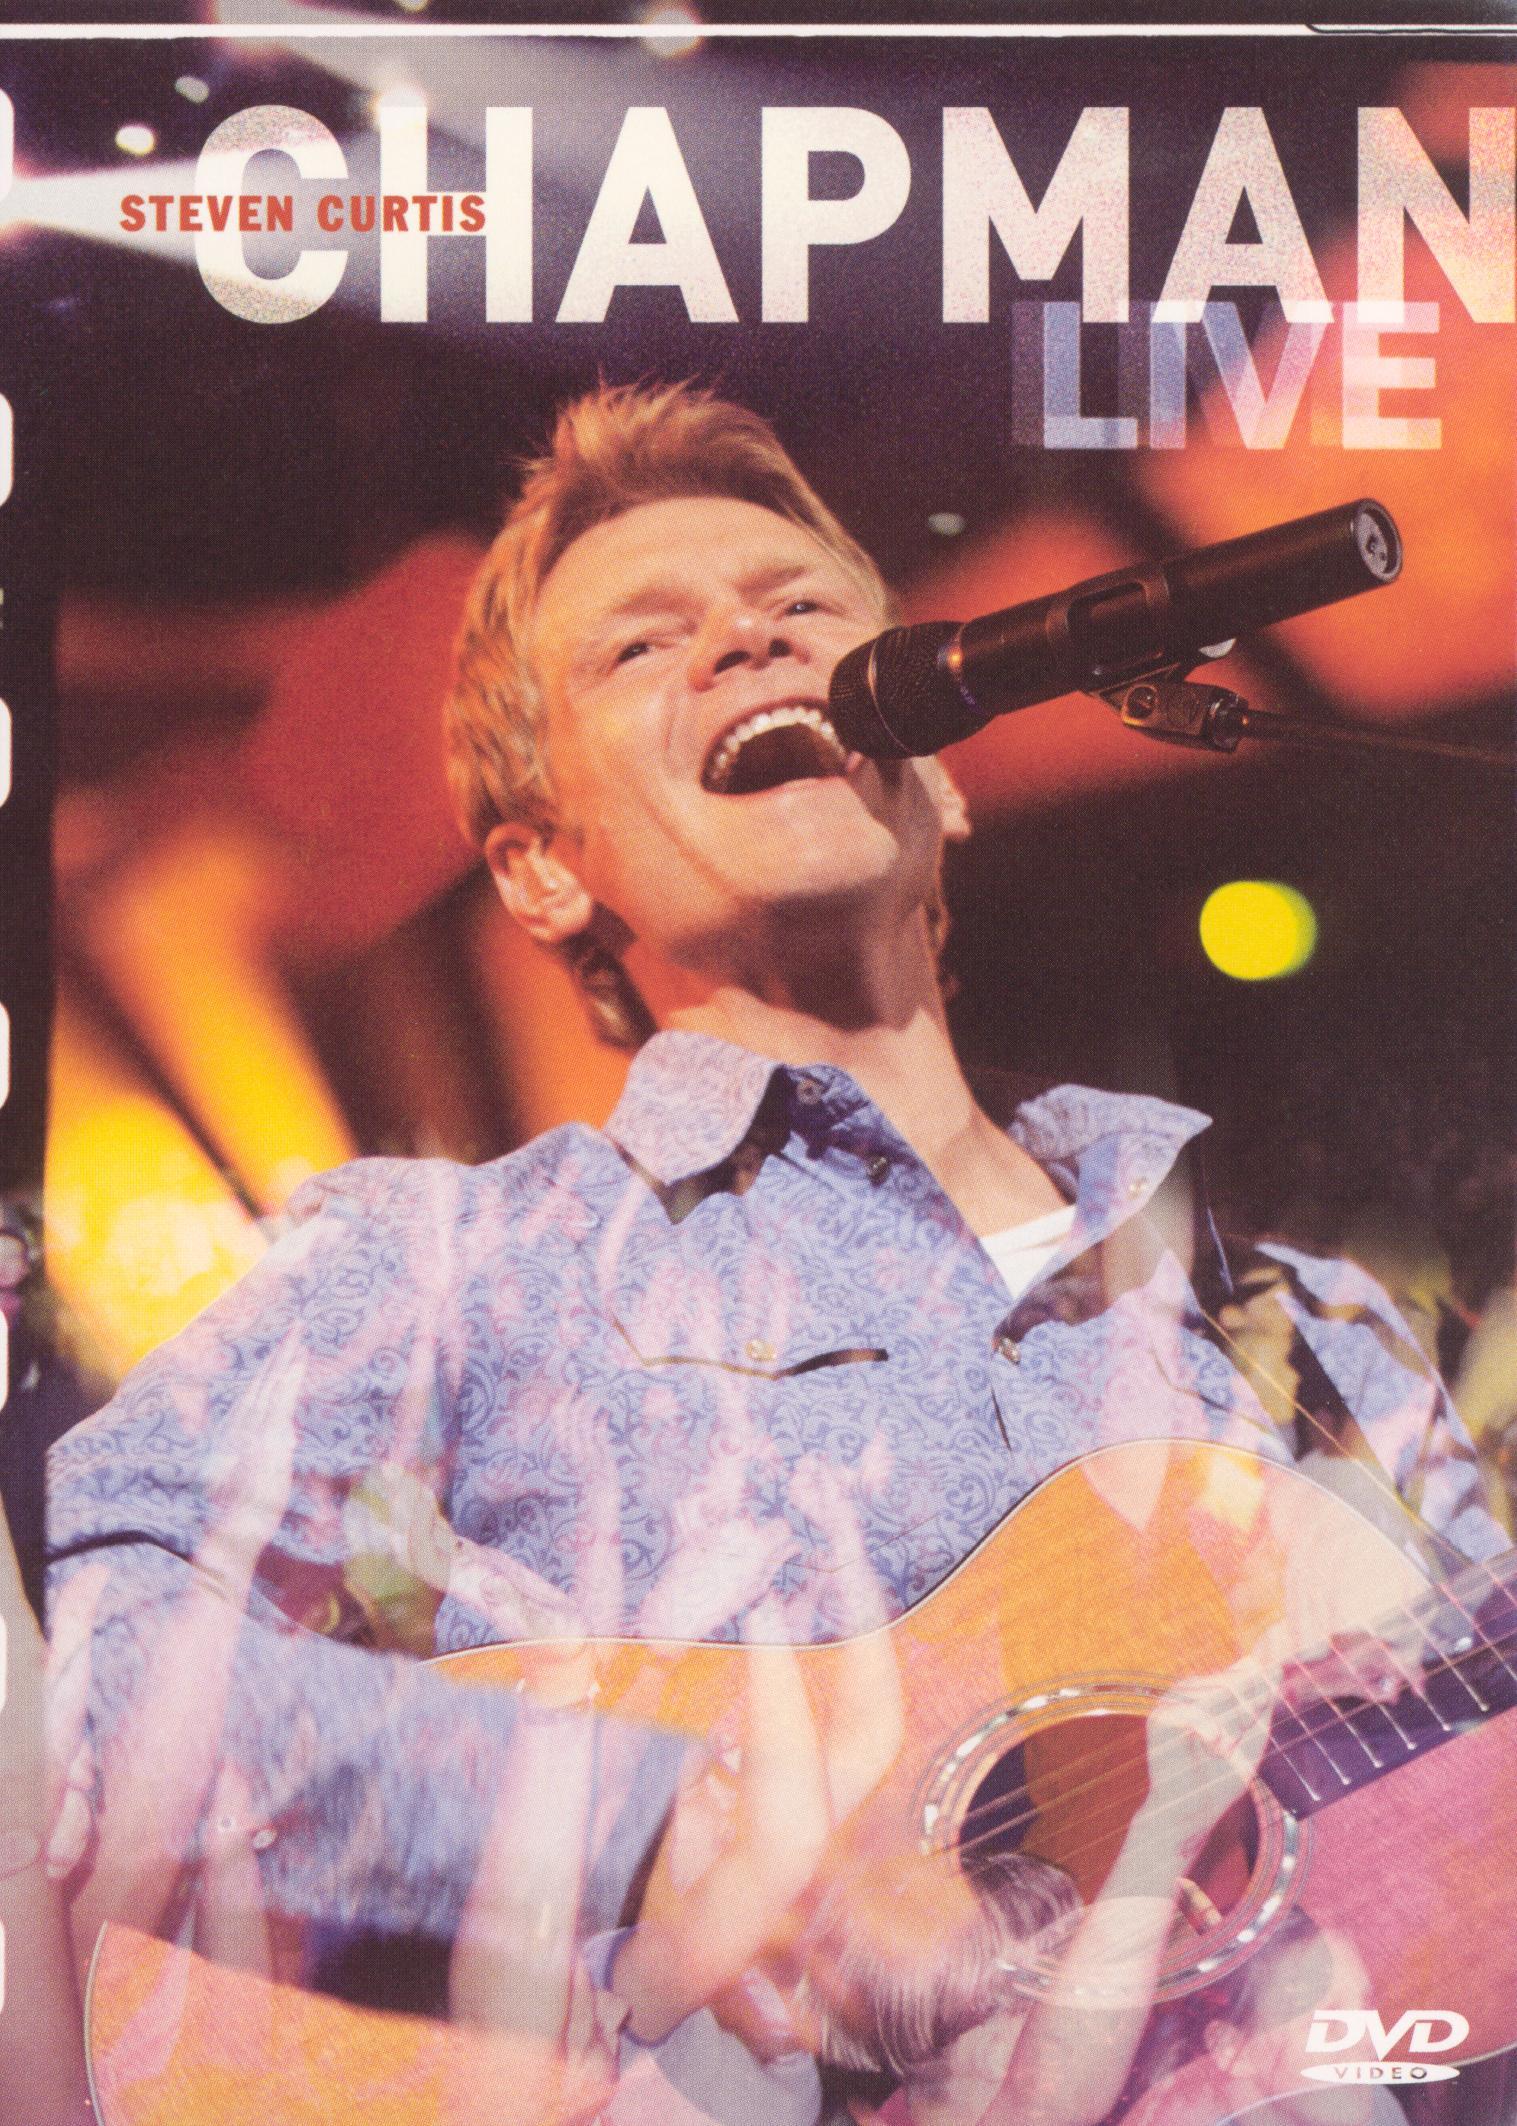 Steven Curtis Chapman: Live